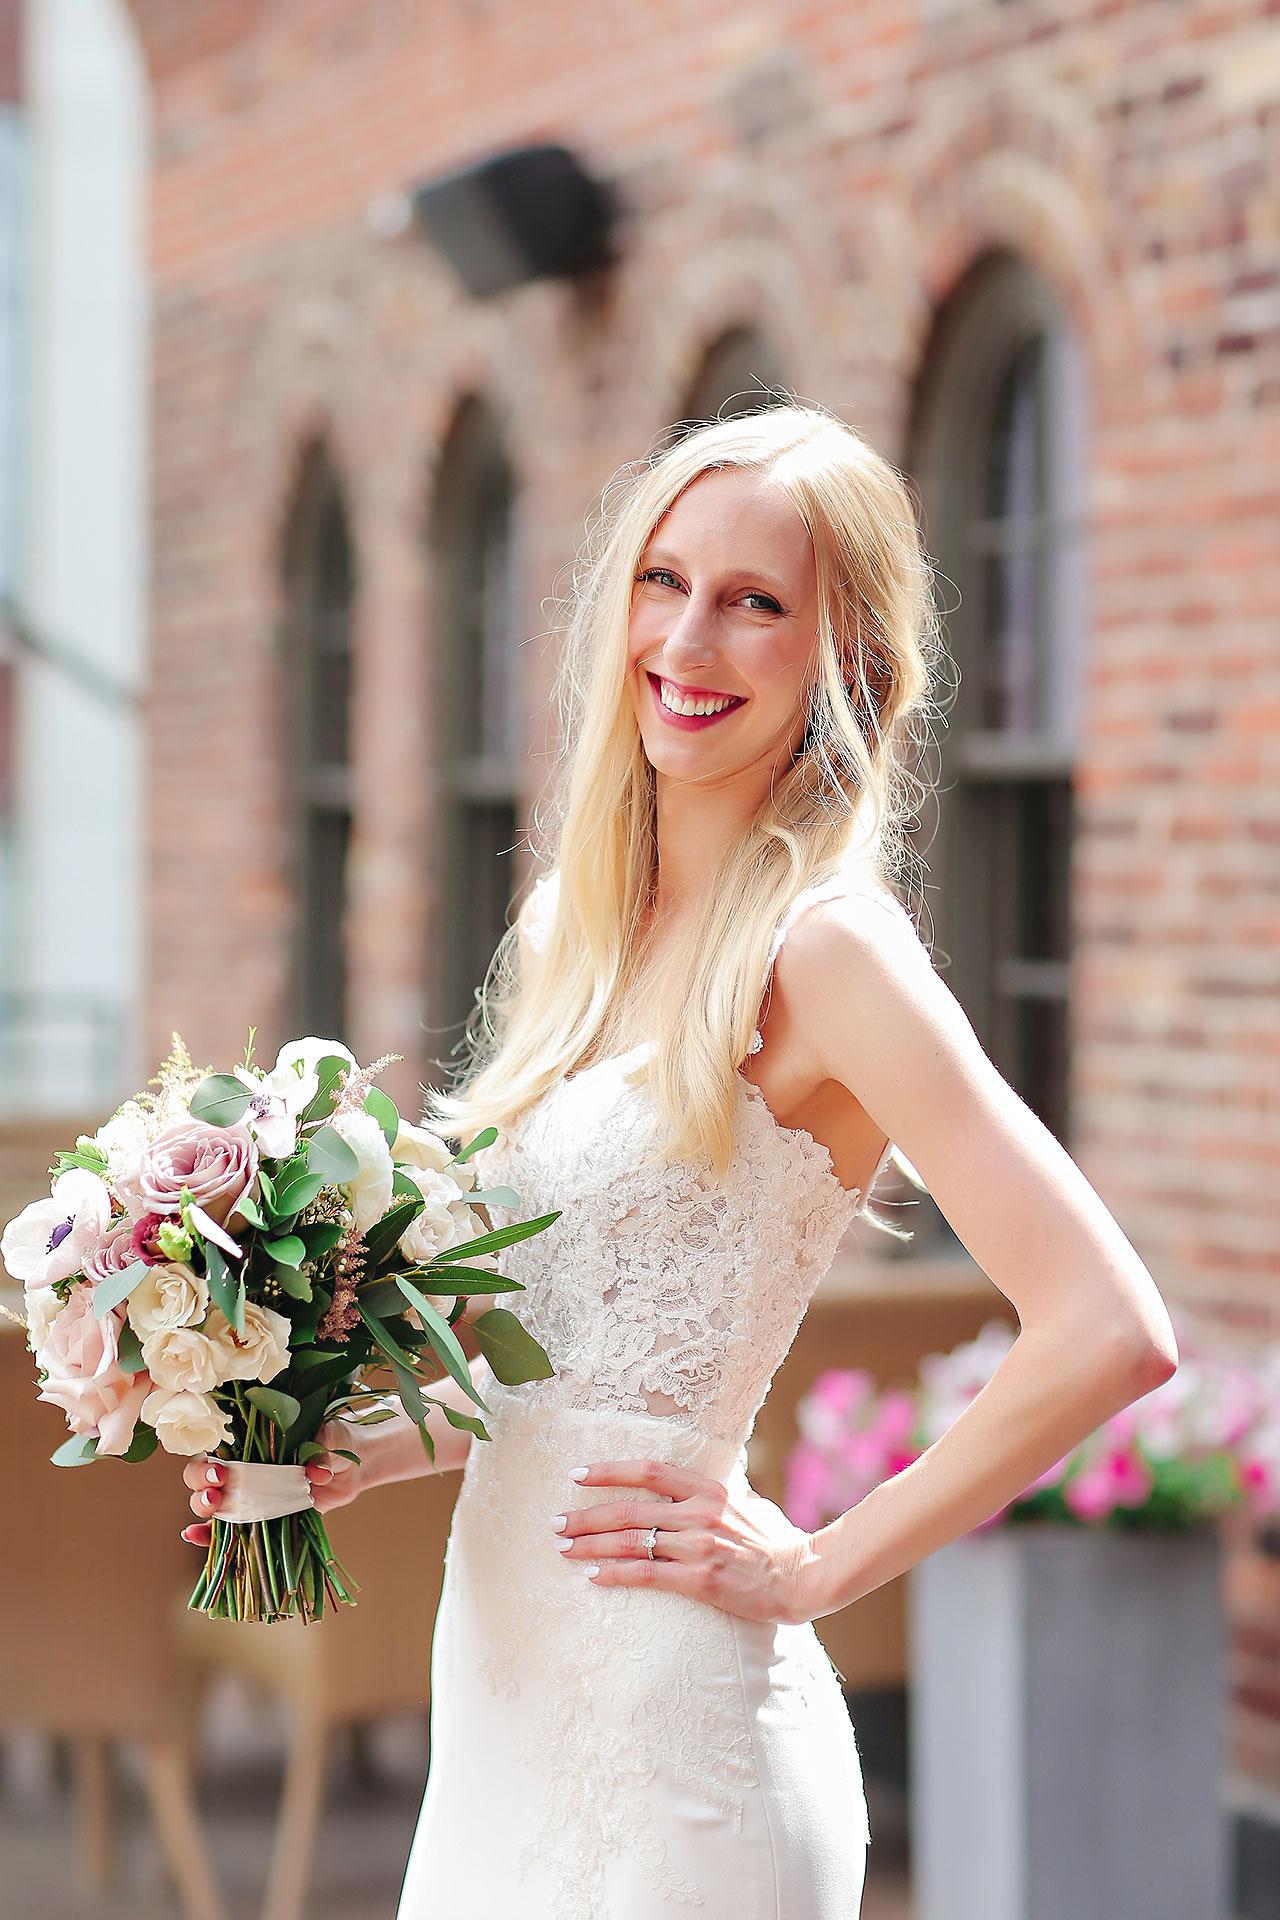 Molly Declan Scottish Rite Indianapolis Wedding 048